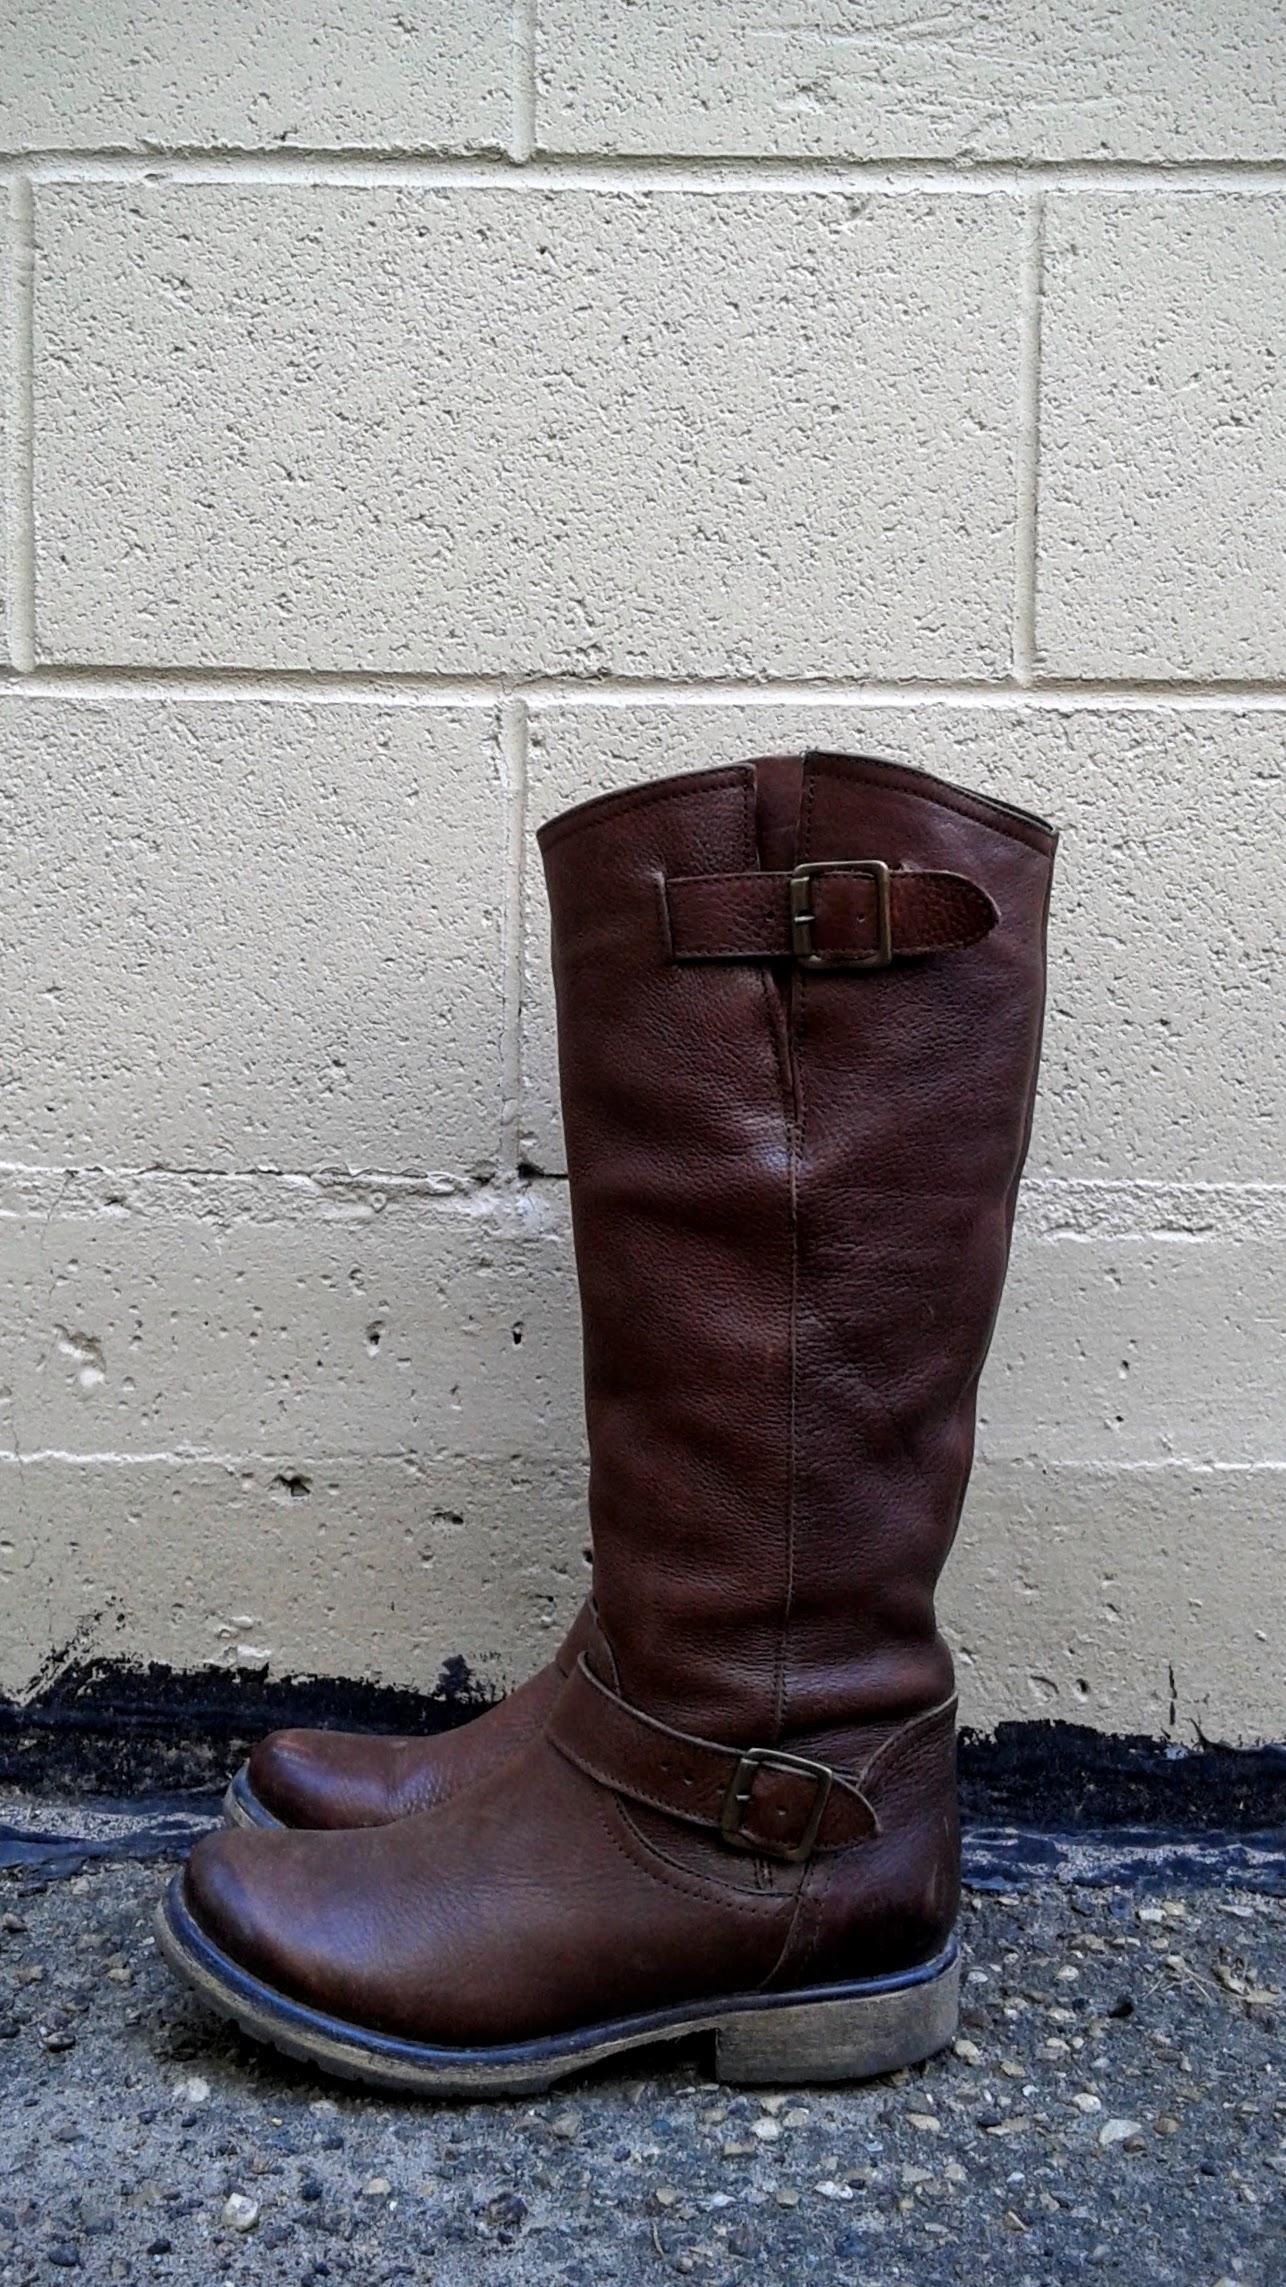 Steve Madden boots; S8.5, $45